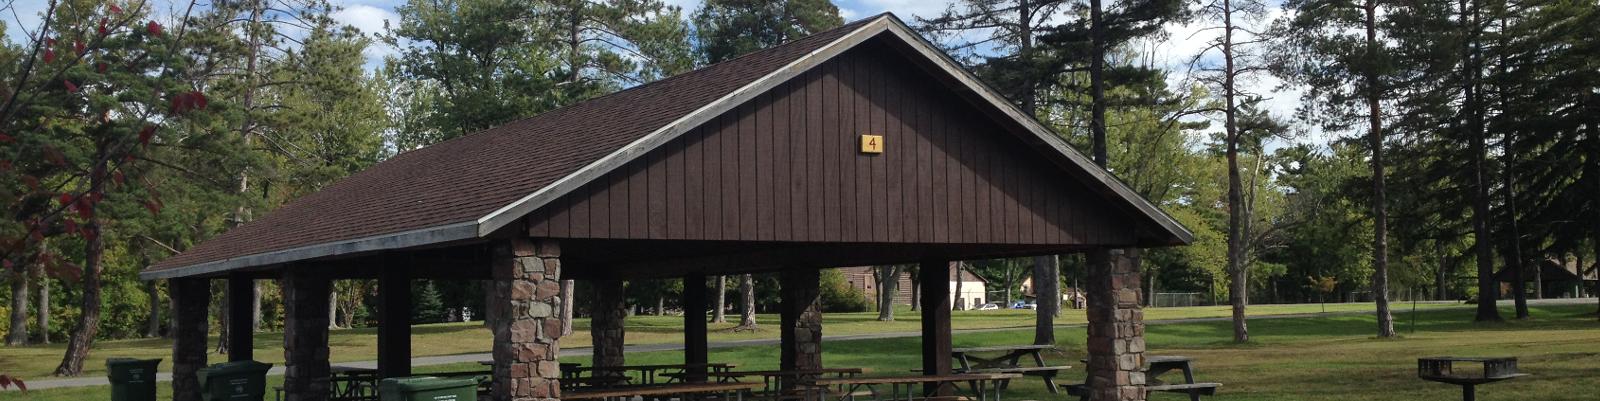 slide:Erie County Parks